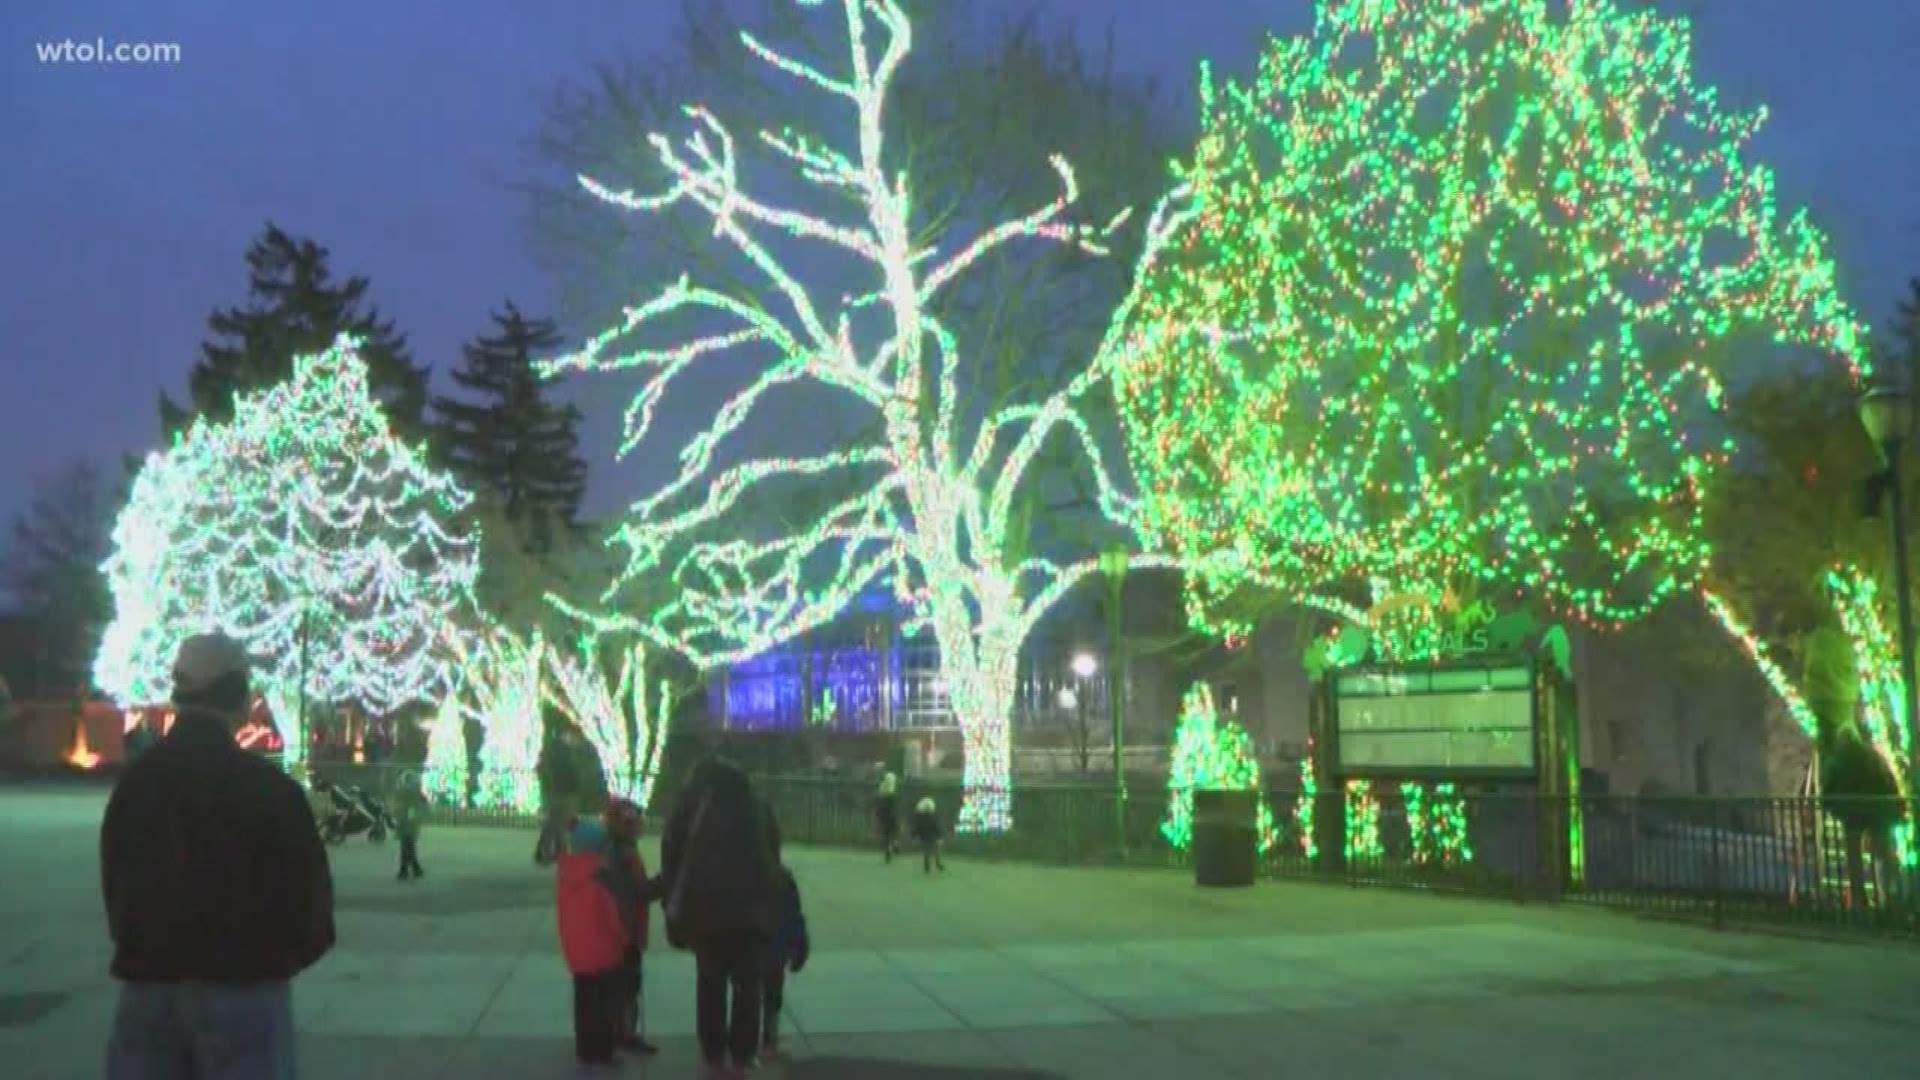 Spokane Washington Christmas Tree Lighting 2020 Where can I buy Lights Before Christmas tickets? | krem.com